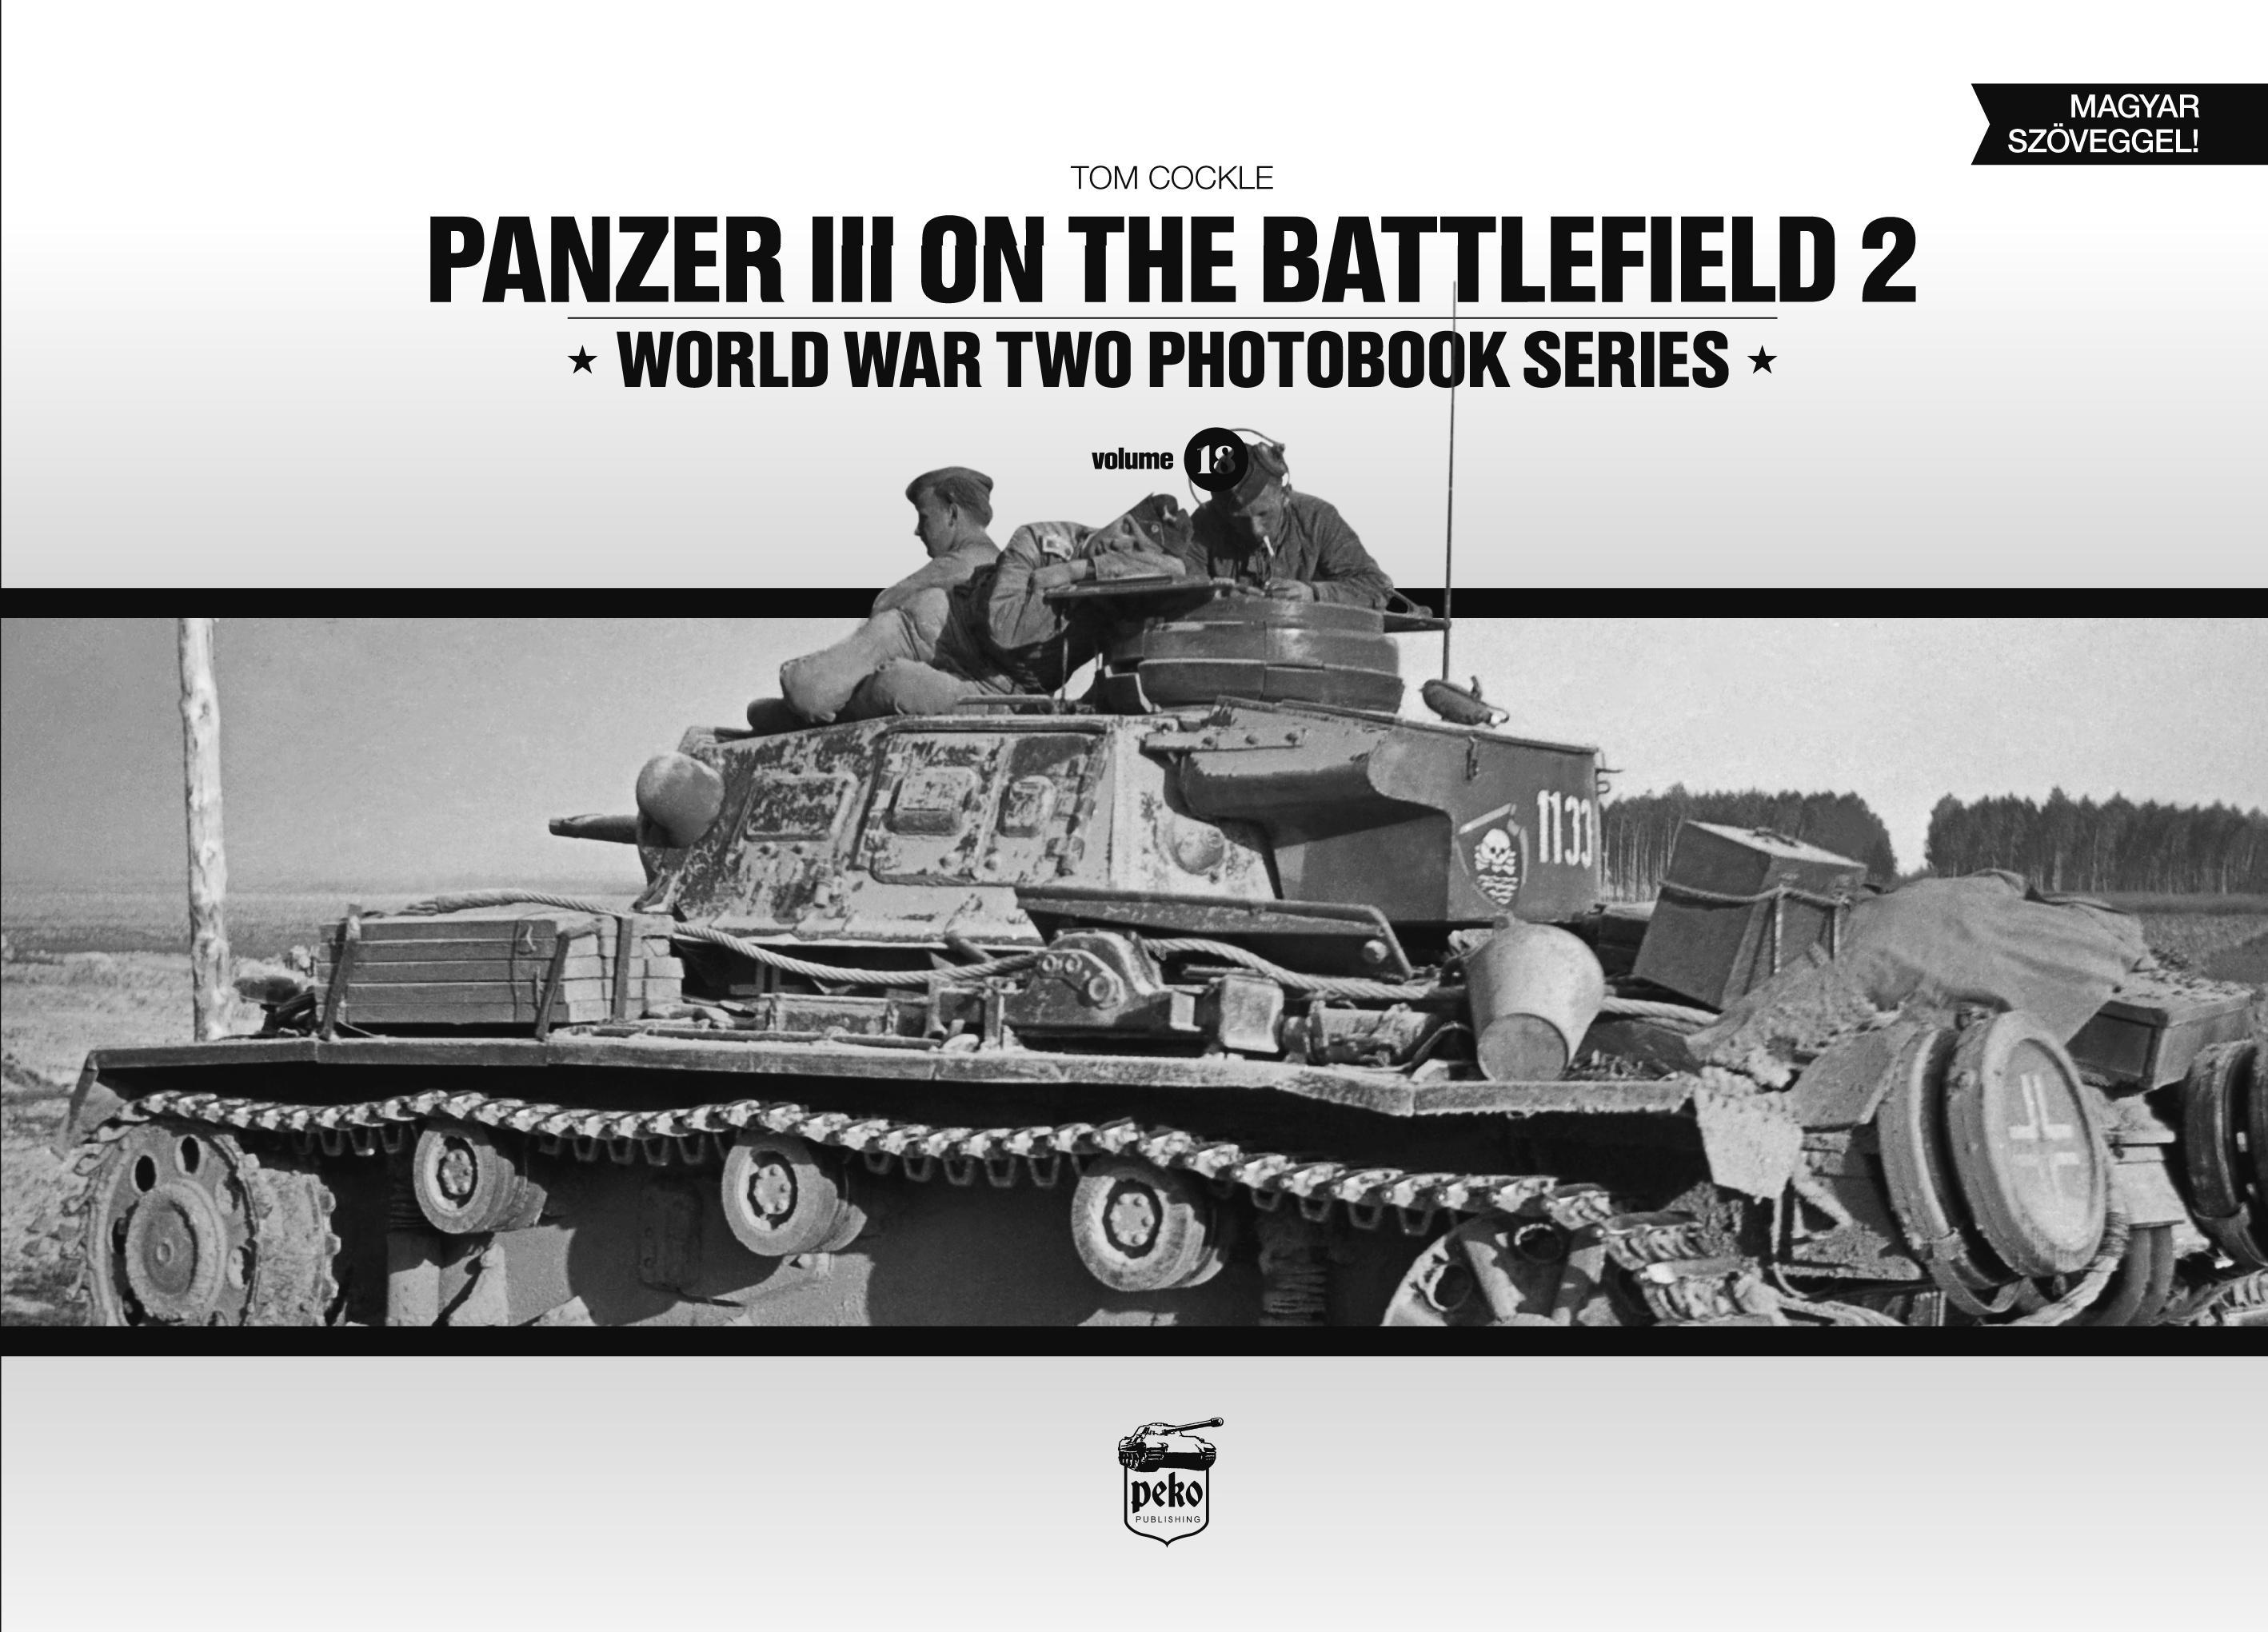 PANZER III ON THE BATTLEFIELD 2.